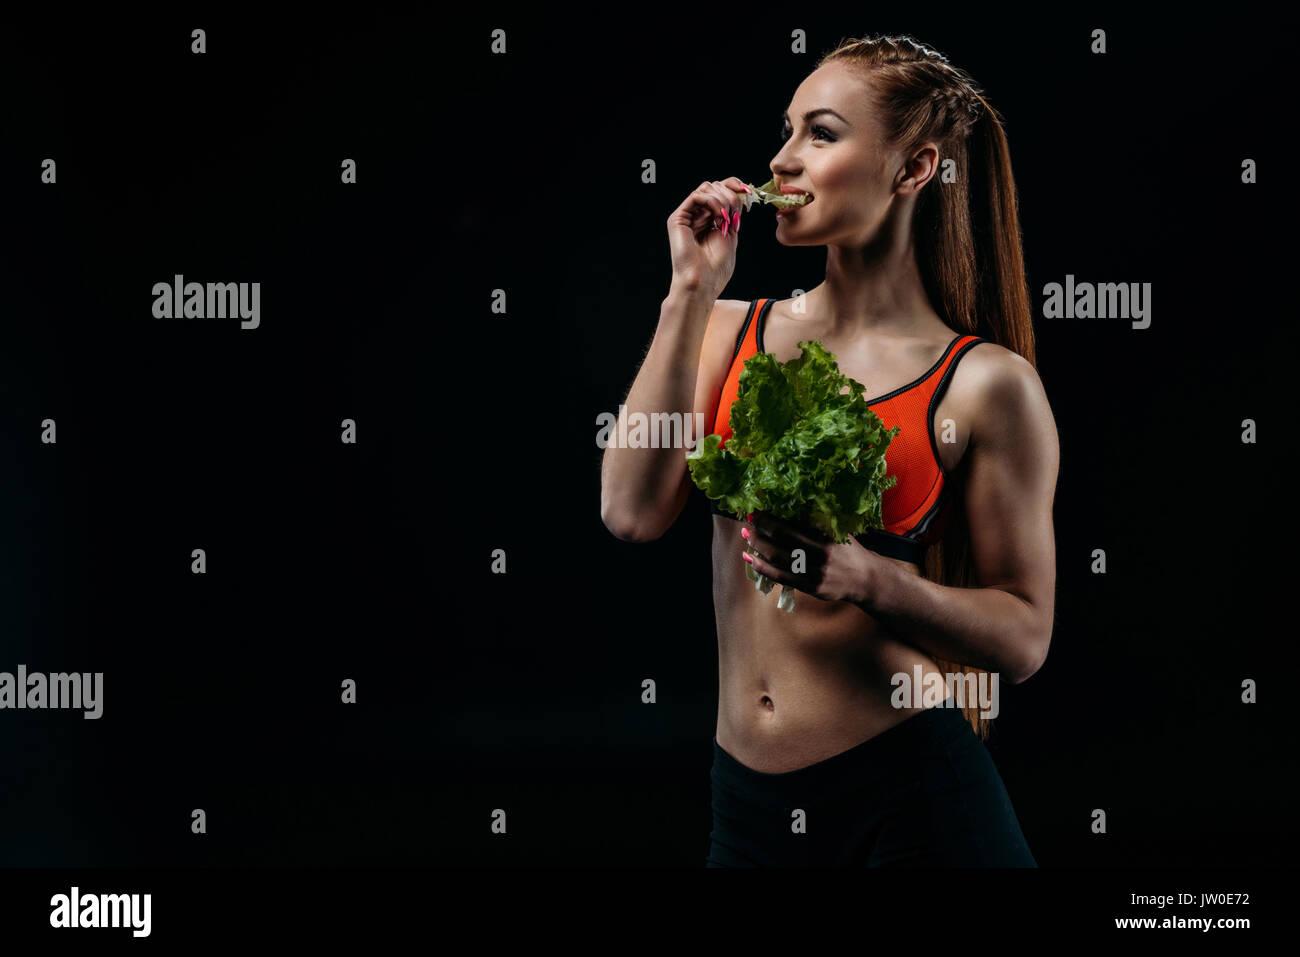 Feliz sportswoman caucásica comer ensalada deja aislado en negro, comer sano concepto Imagen De Stock